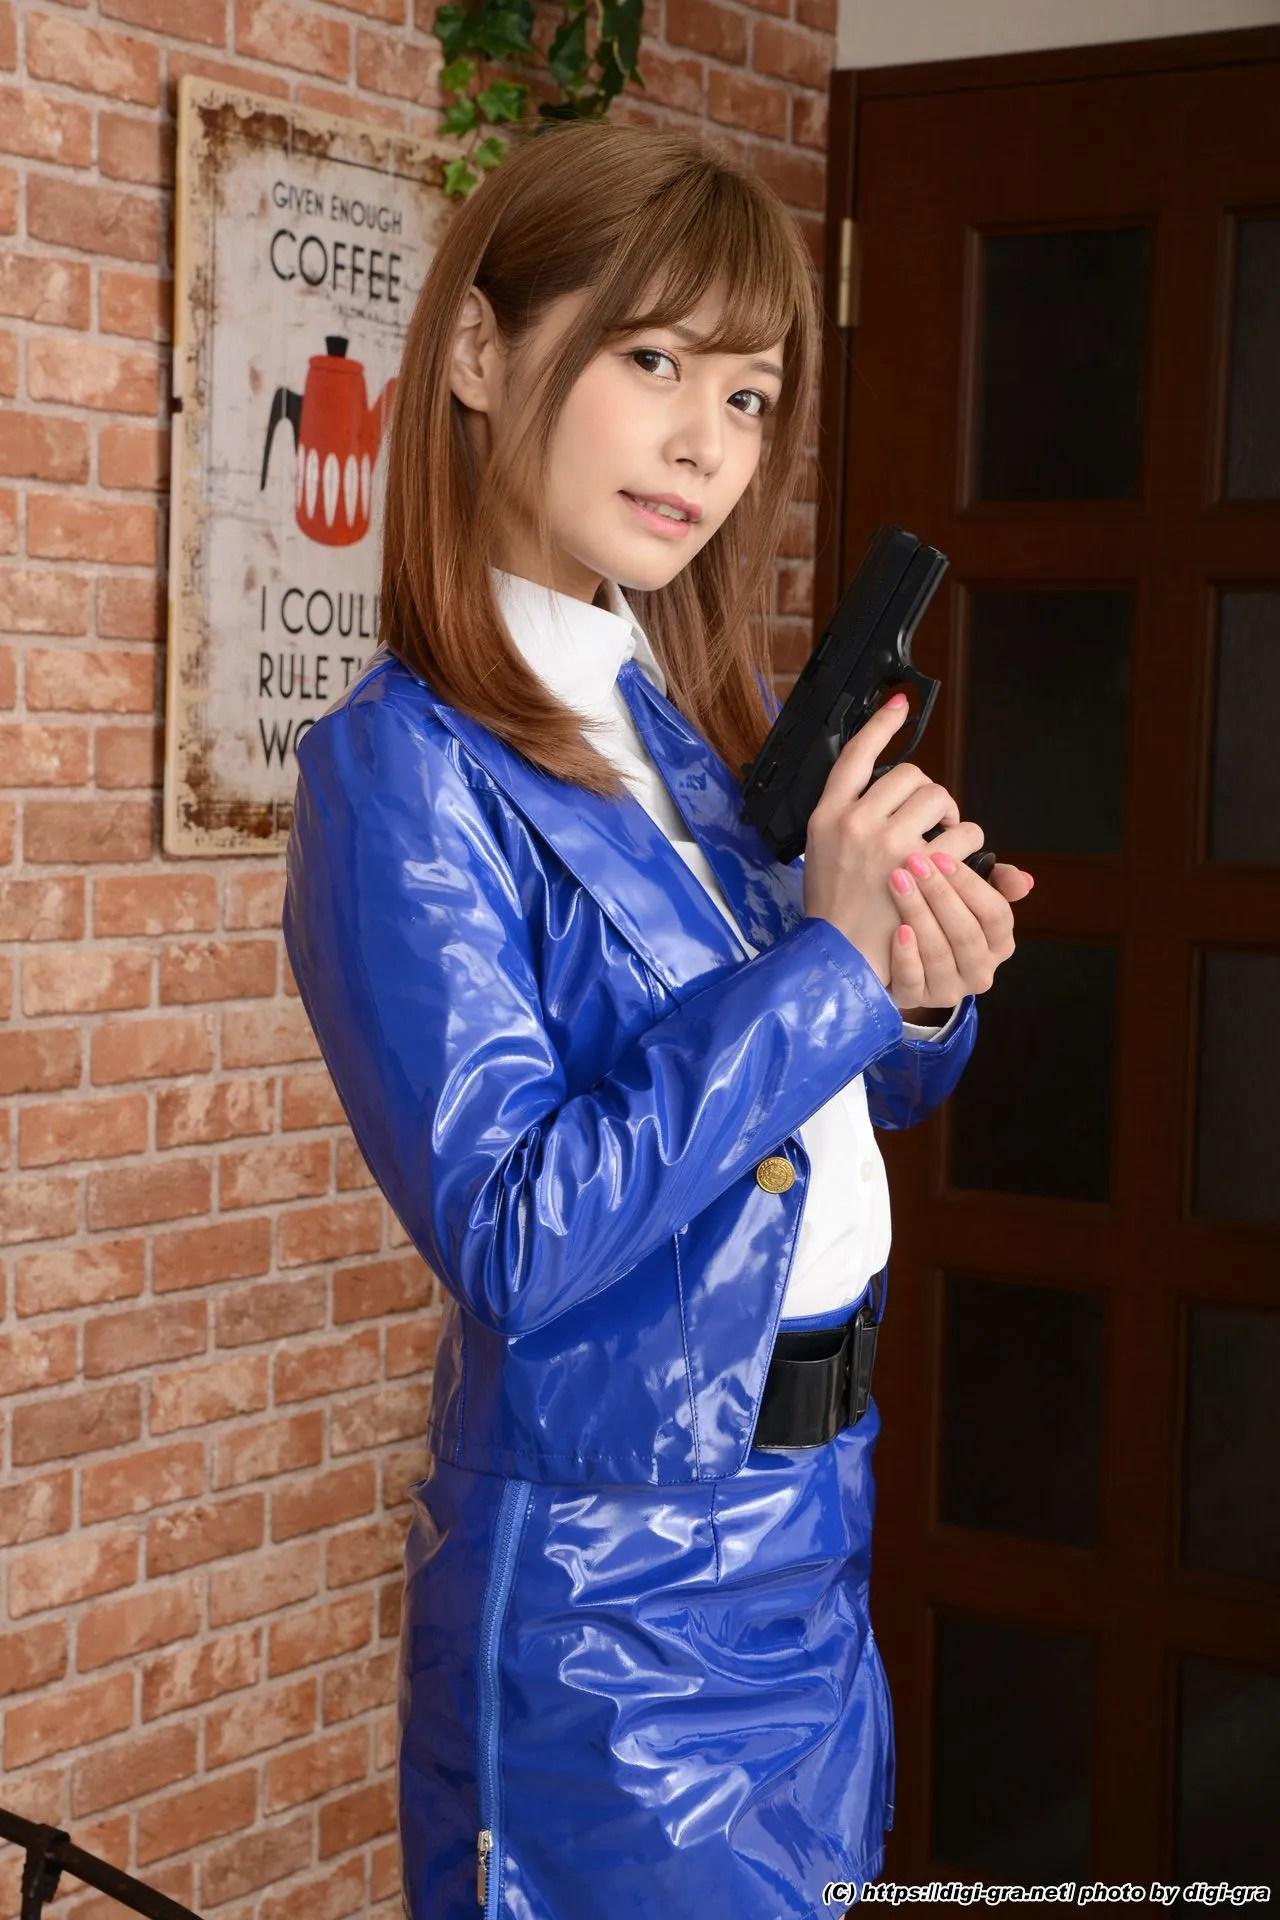 [Digi-Gra] Hikaru Konno 绀野ひかる Photoset 07 写真集[74P]插图(8)